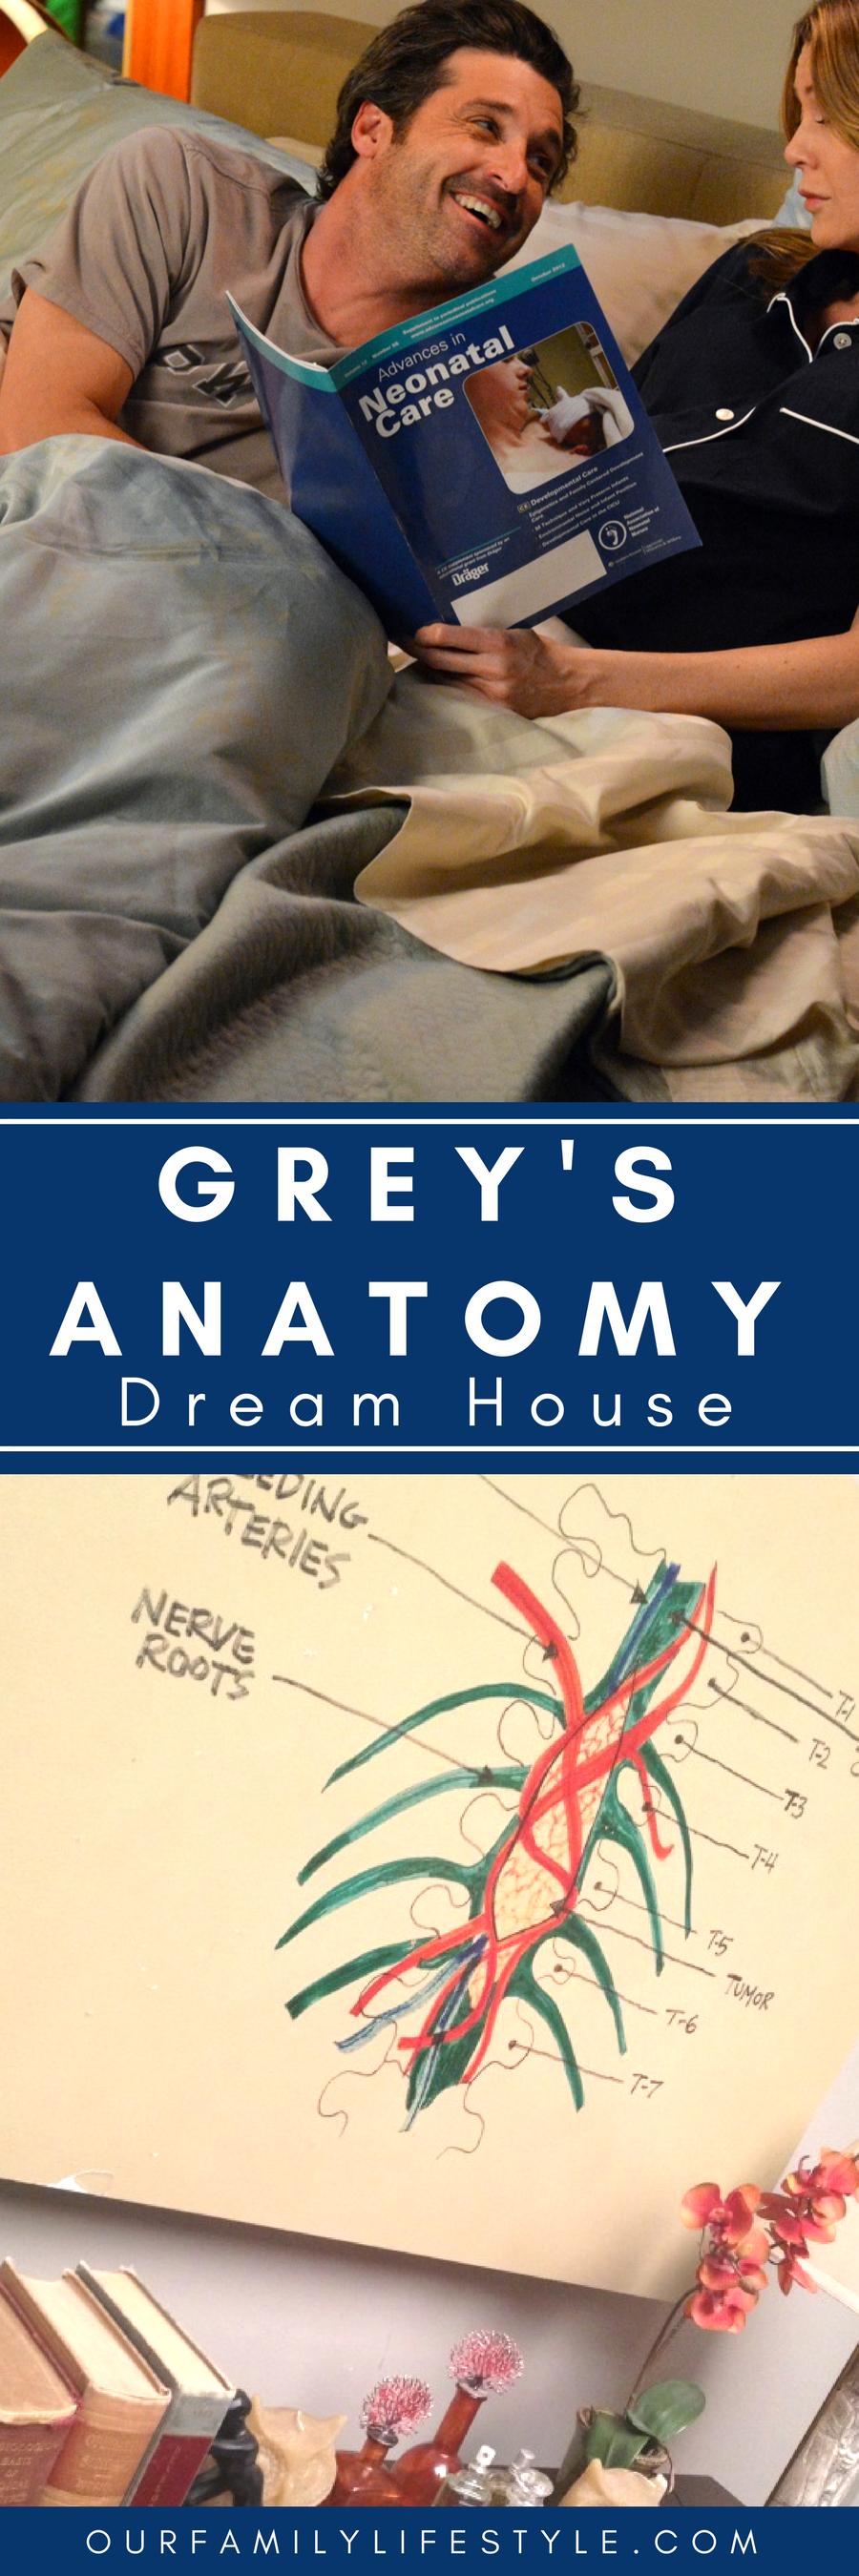 Walking Through The Dream House Of Greys Anatomy